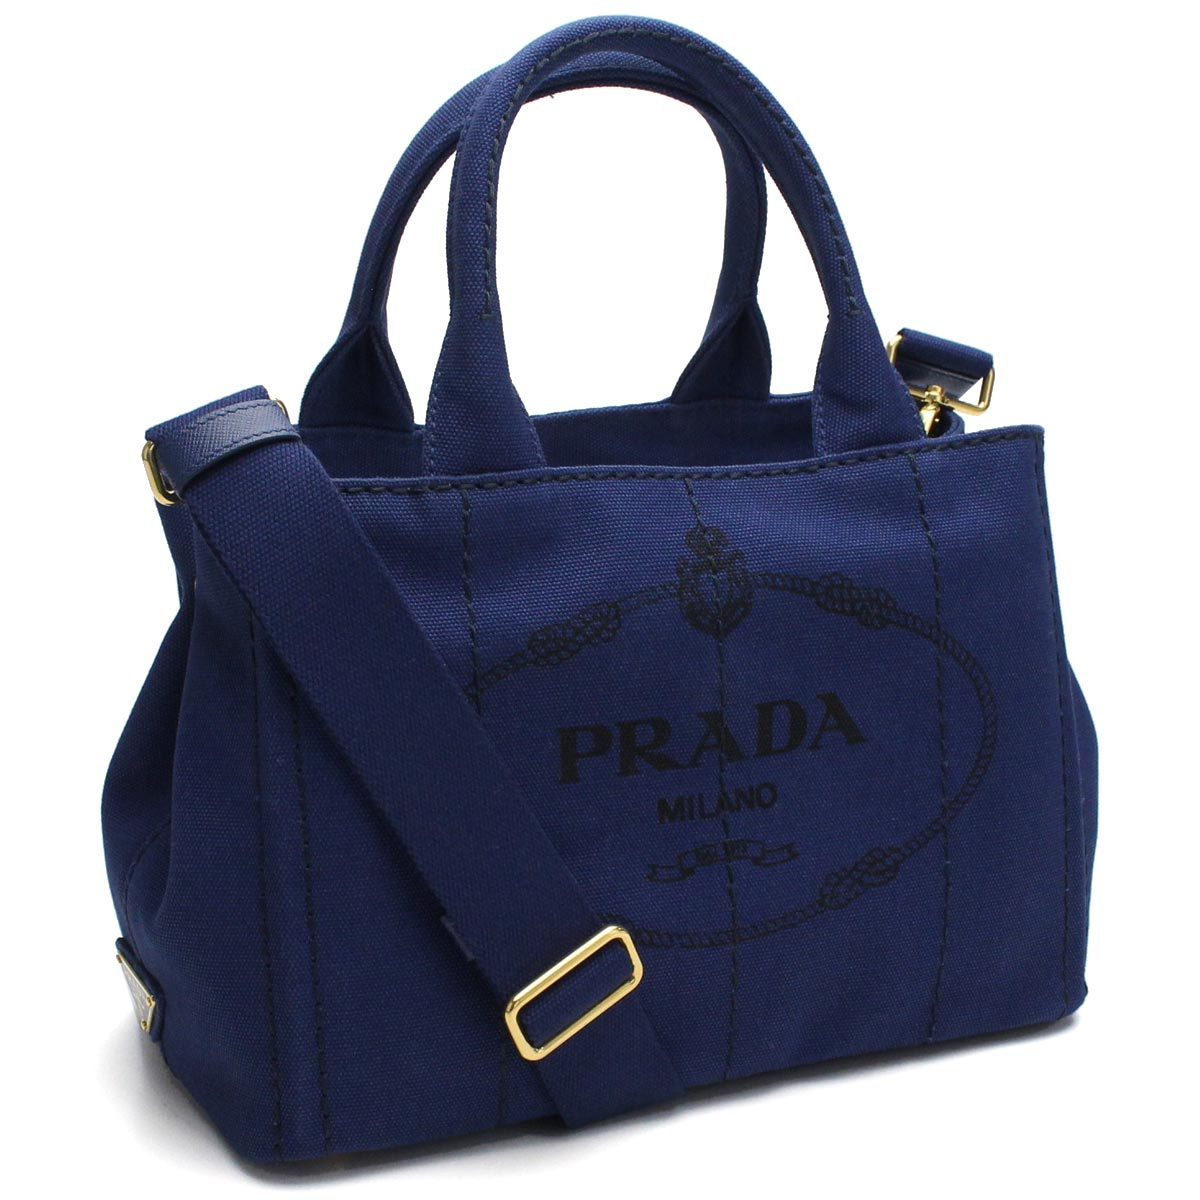 bfa3c55690 Bighit The total brand wholesale: 普拉達(PRADA)大手提包1BG439 ZKI F0016 BLUETTE藍色派的|  日本樂天市場